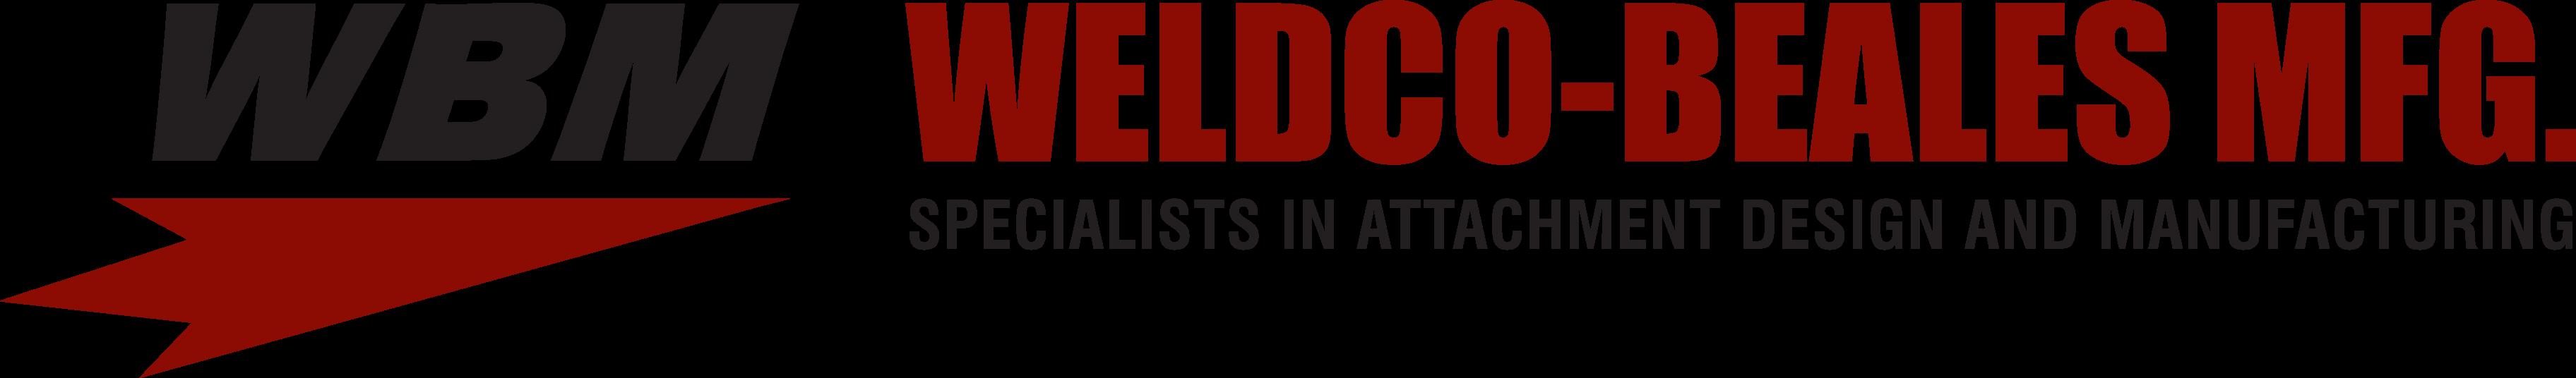 Weldco 2017